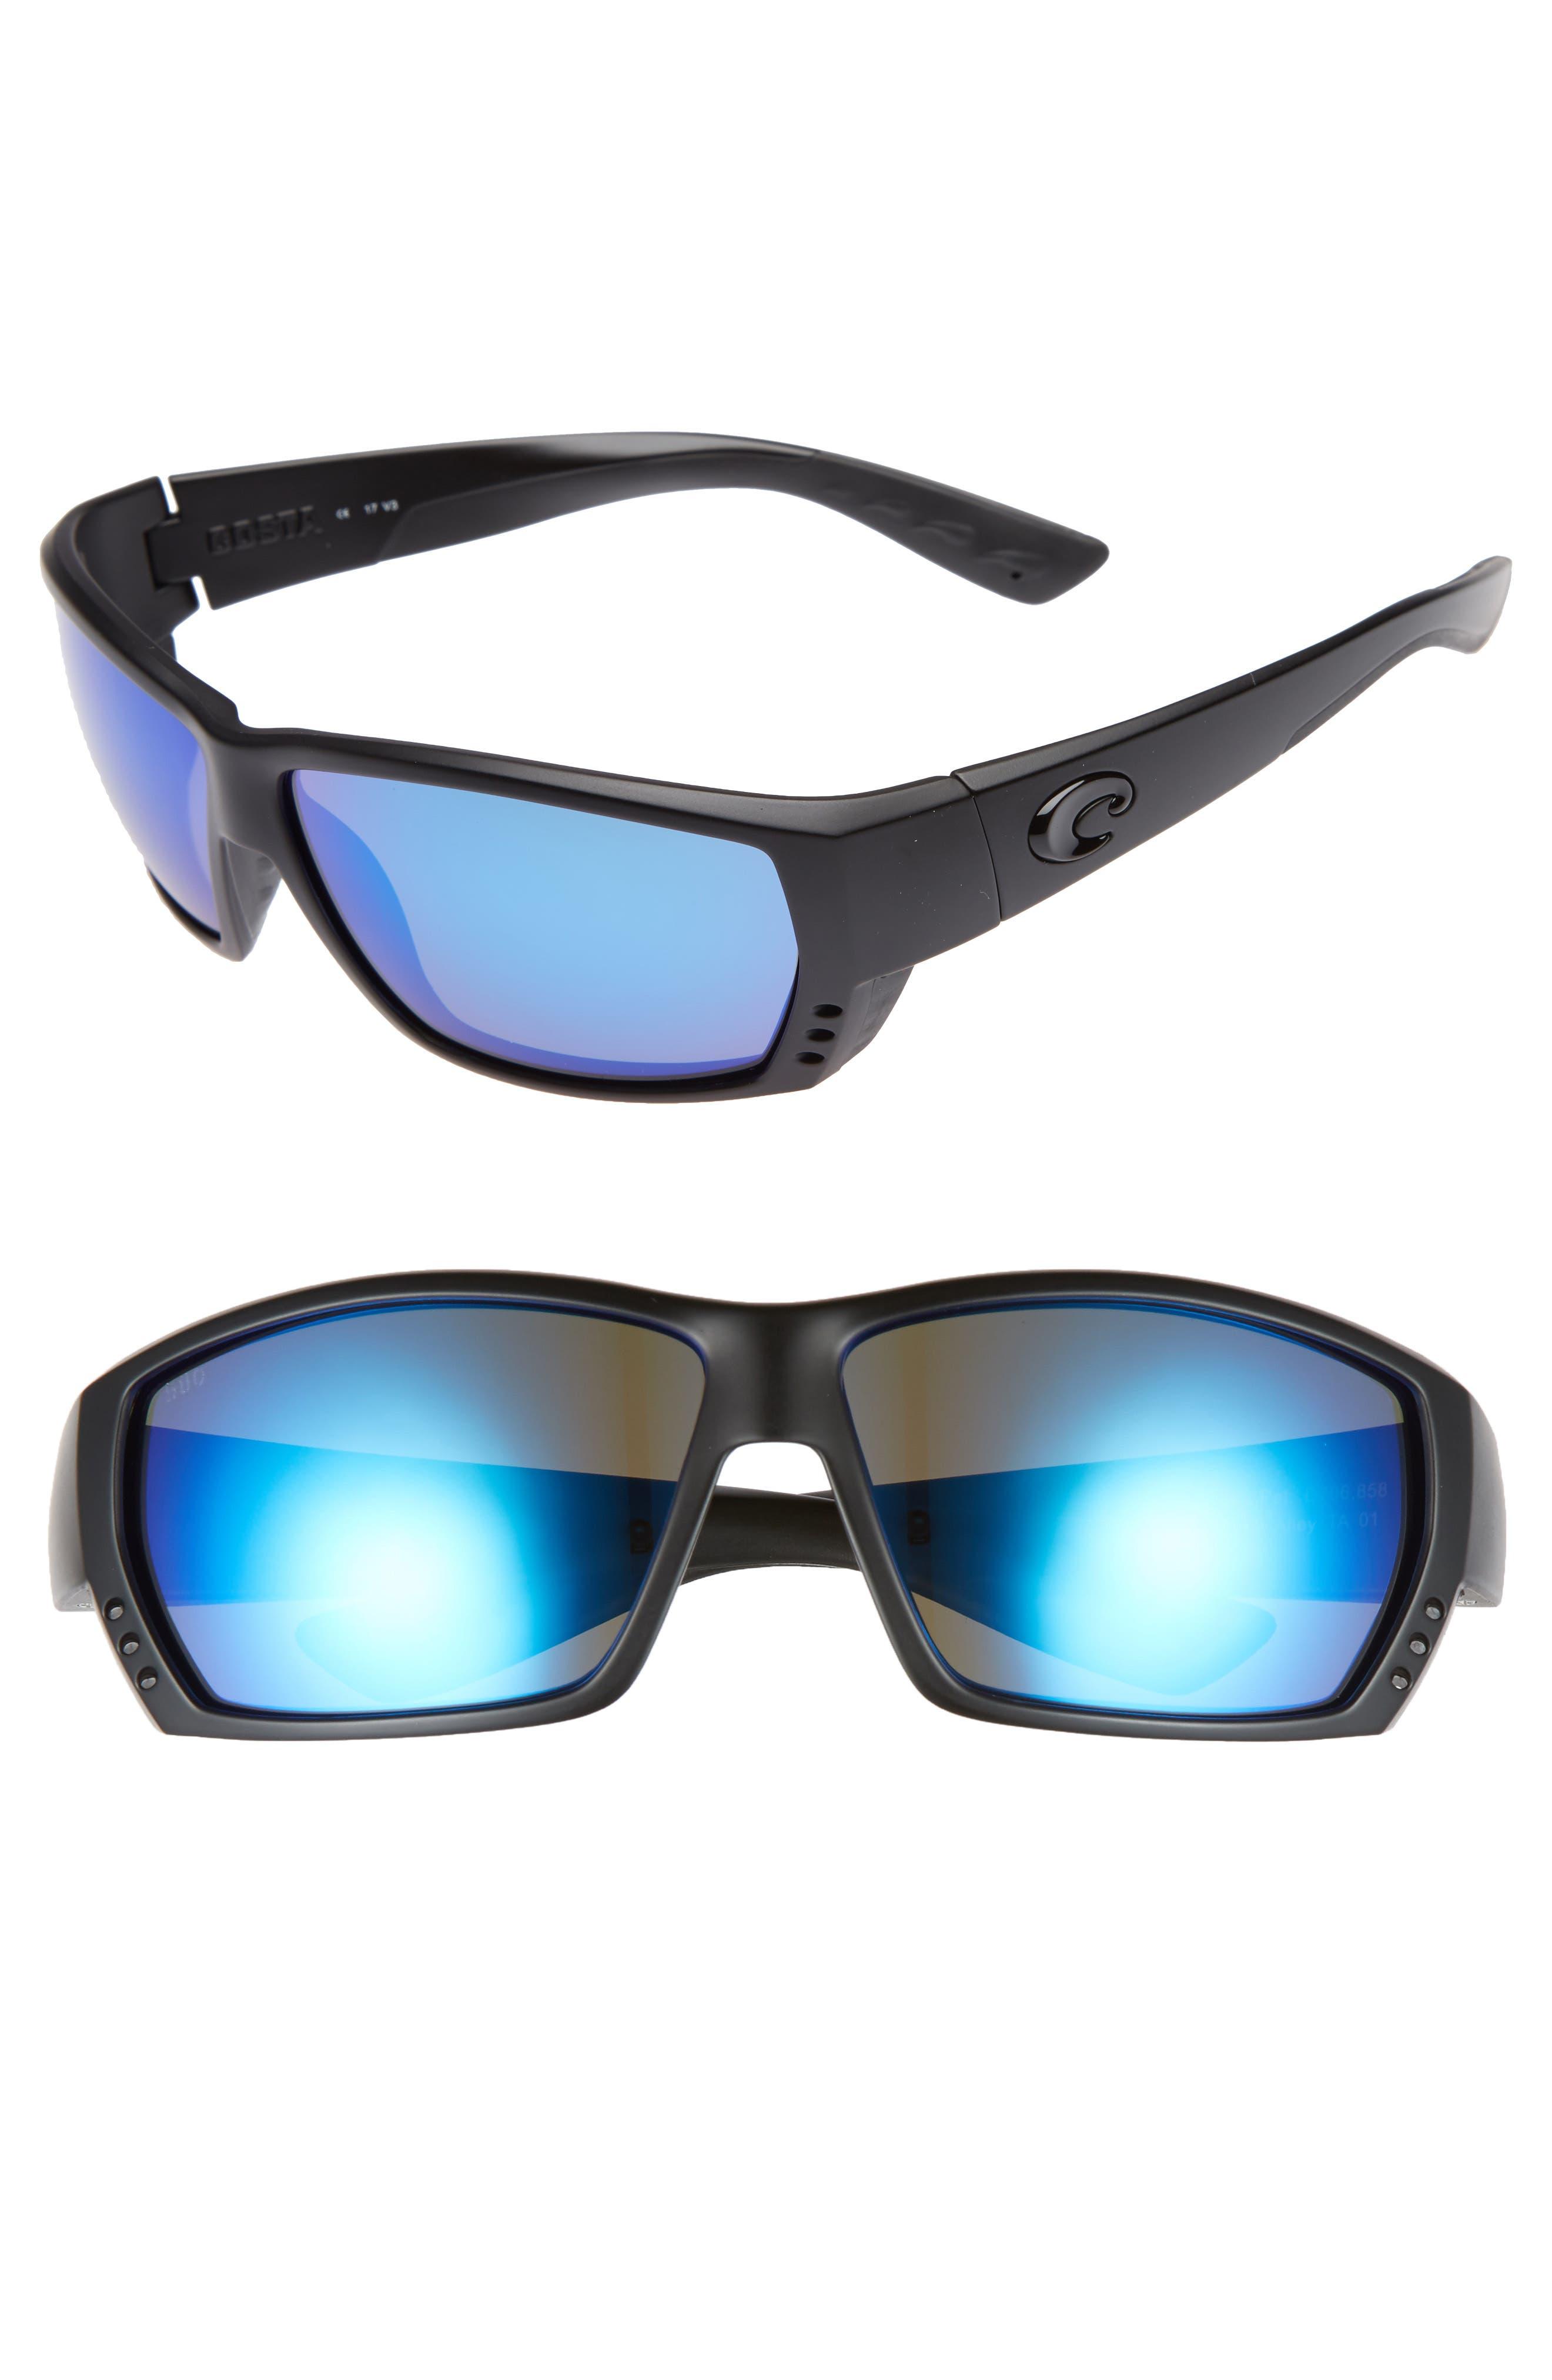 f025cfcb398 Costa Del Mar Tuna Alley 60Mm Polarized Sunglasses - Blackout  Blue Mirror